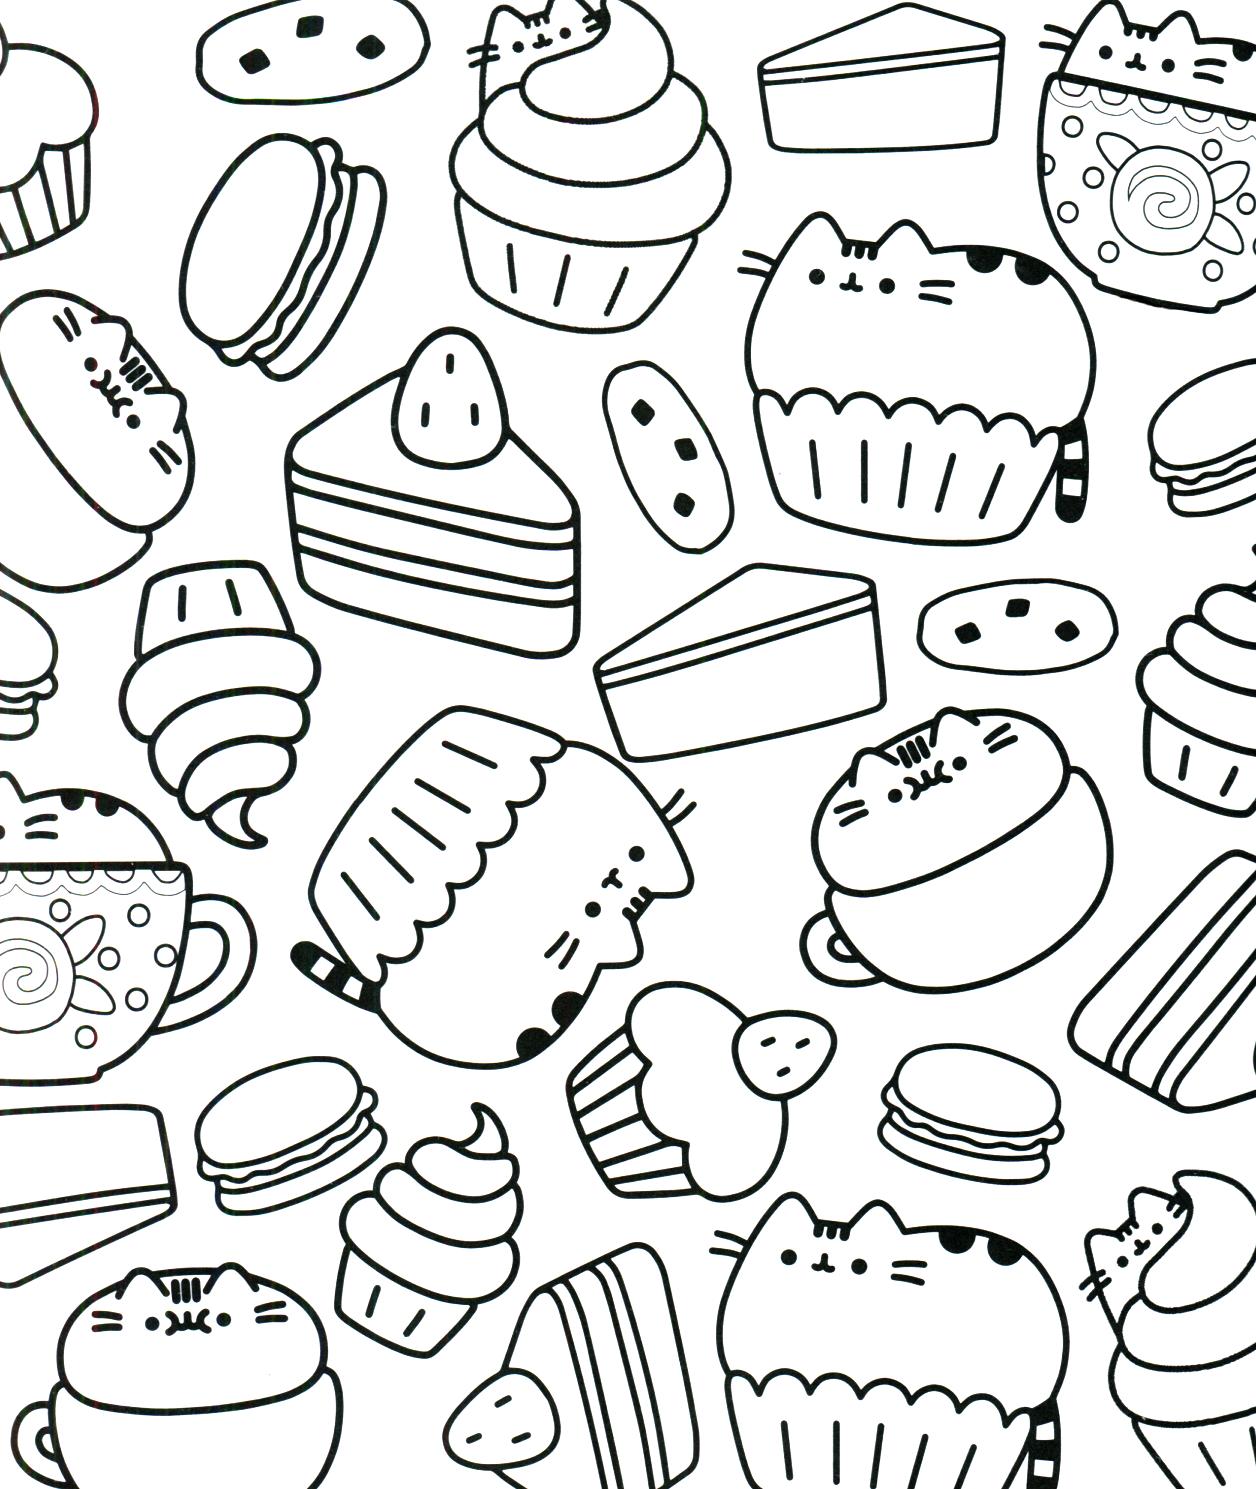 Pusheen Coloring Book Pusheen Pusheen The Cat Disney Coloring Pages Pusheen Coloring Pages Cupcake Coloring Pages